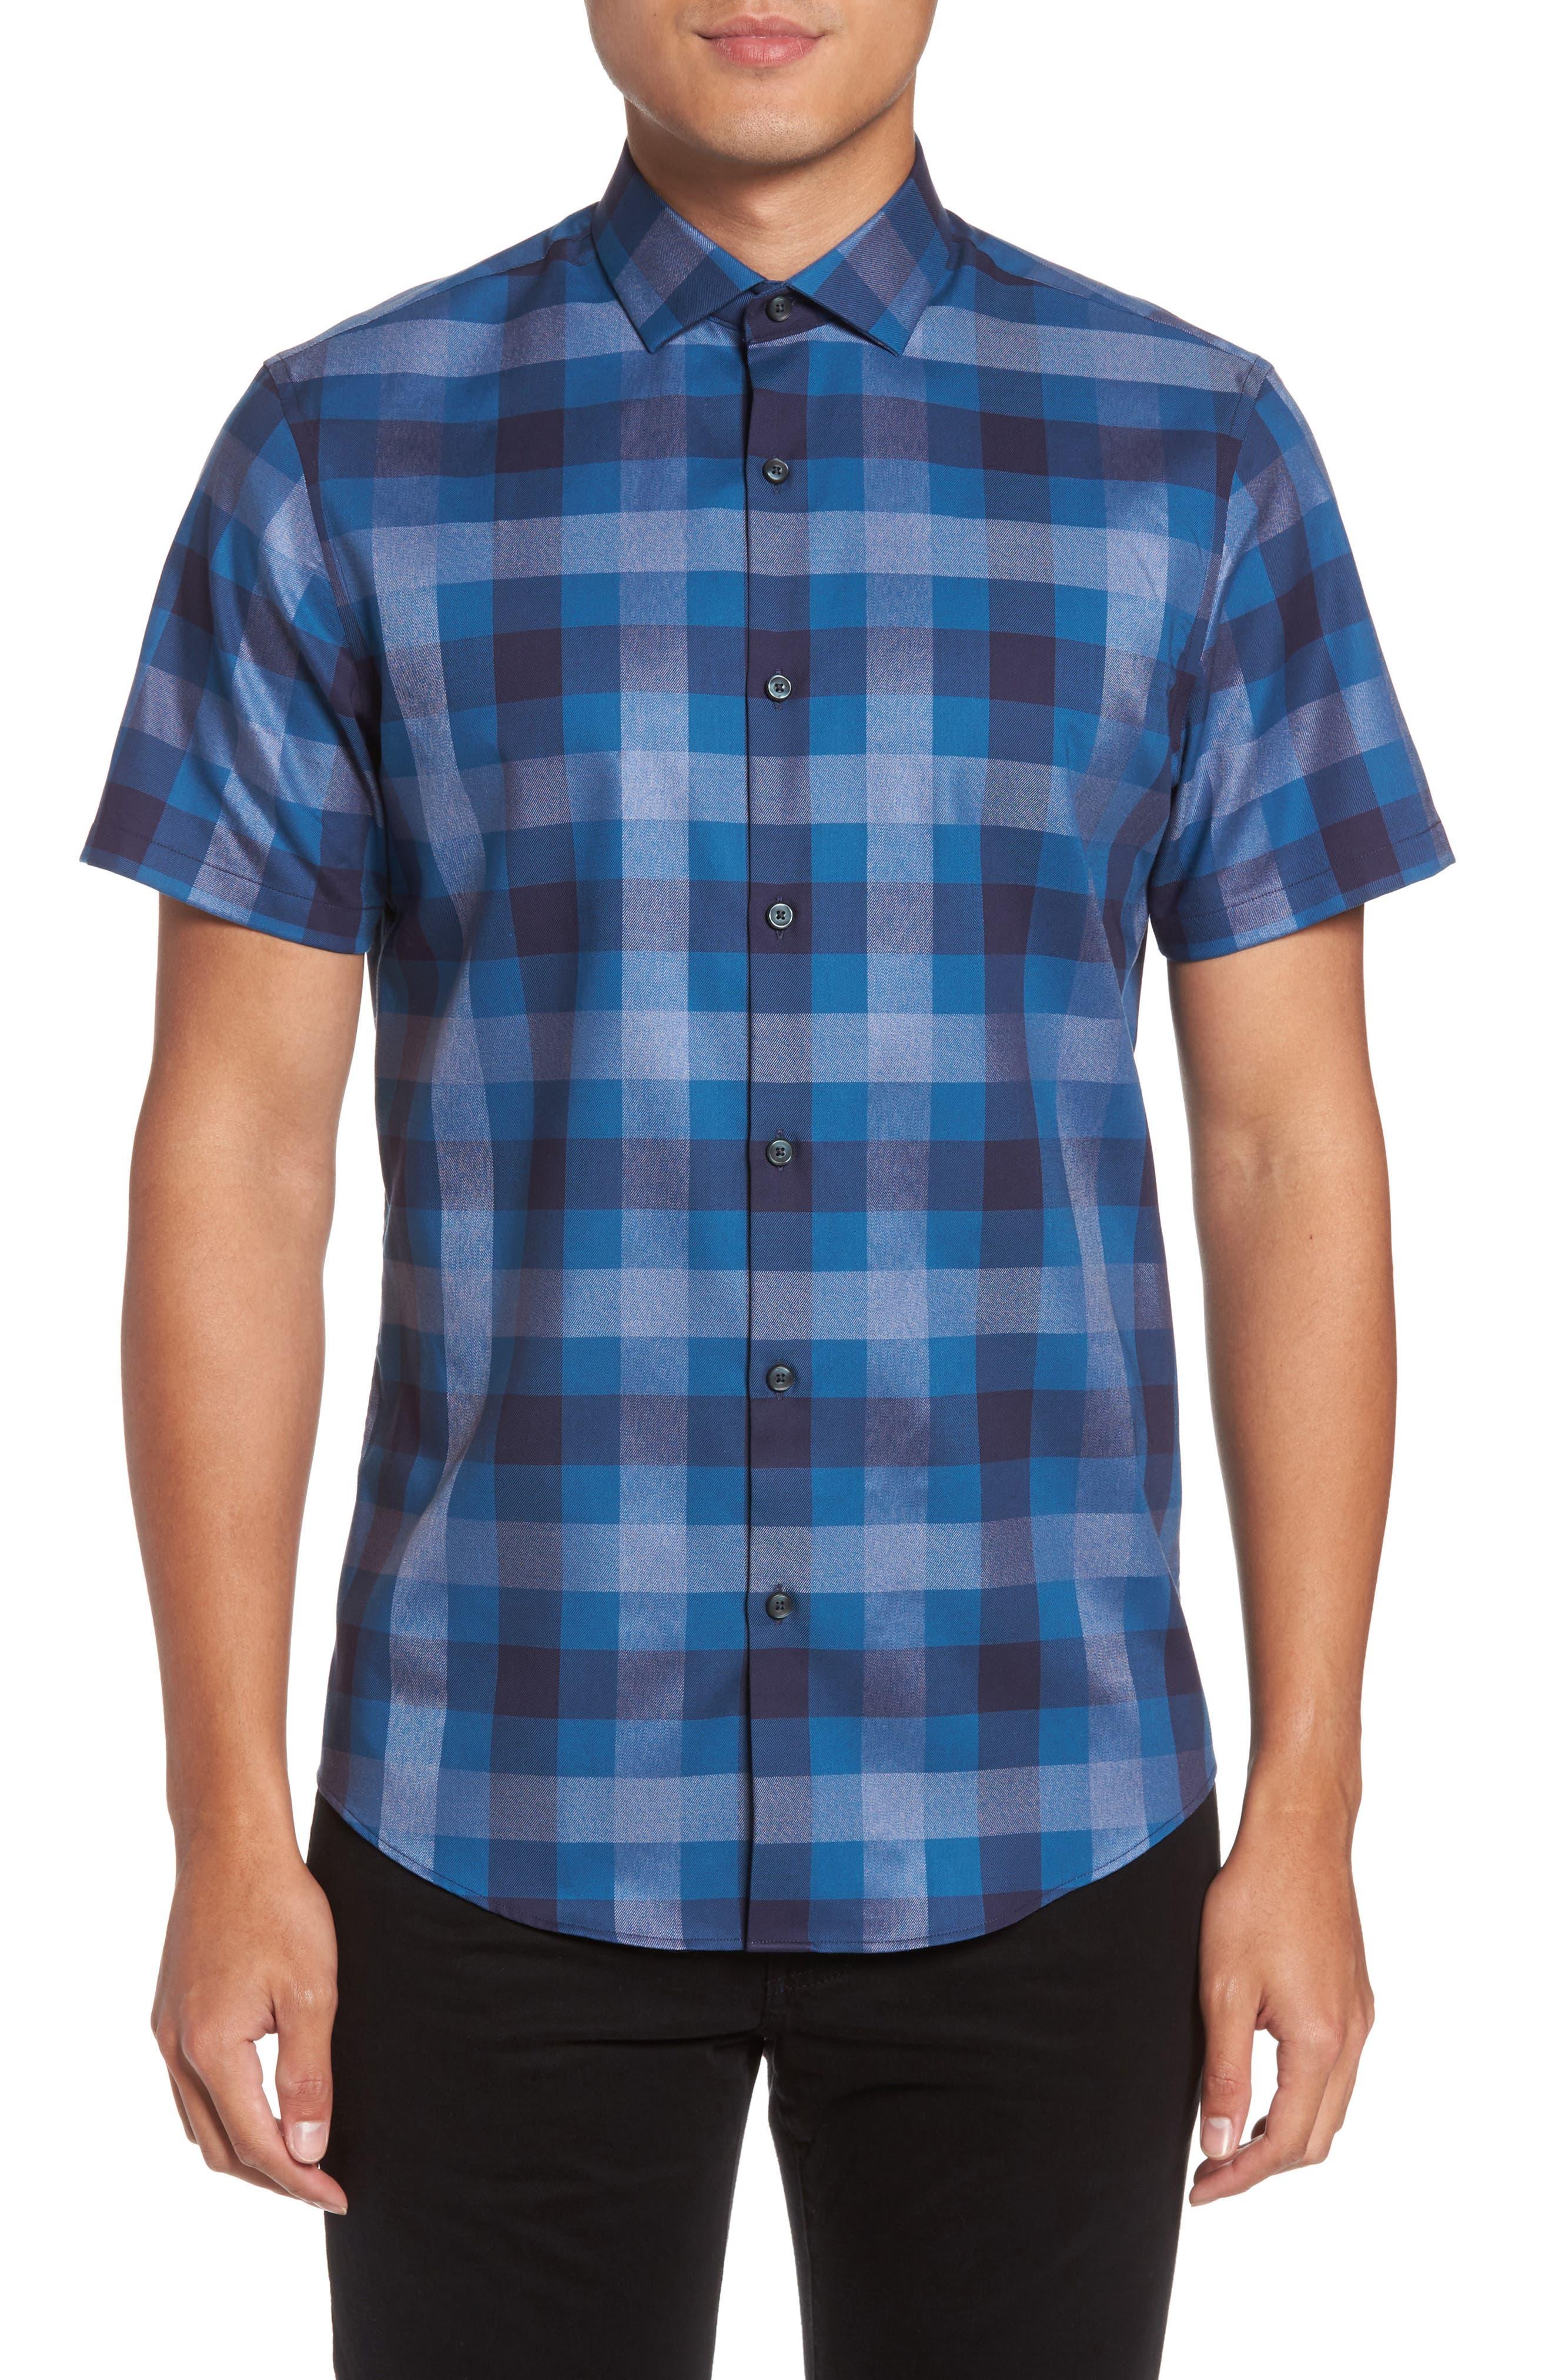 Calibrate No-Iron Large Check Woven Shirt